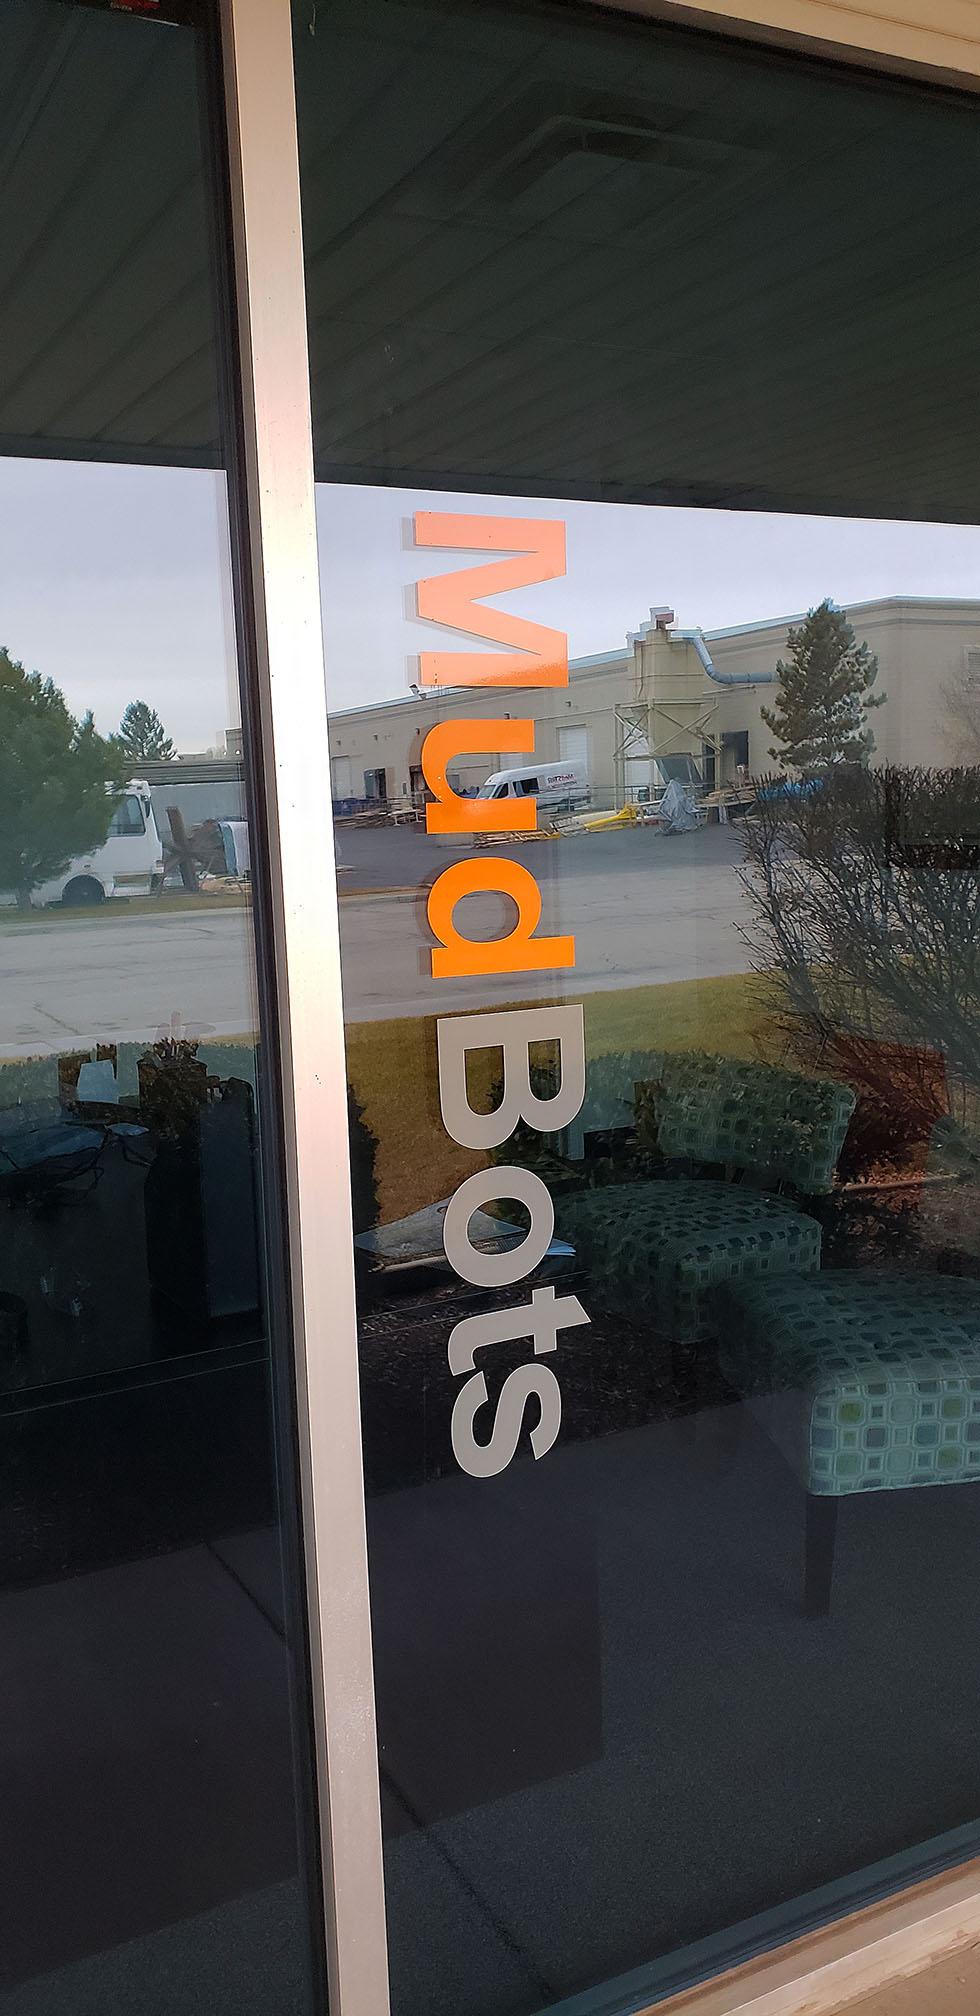 Outside view of Mudbots Utah facility